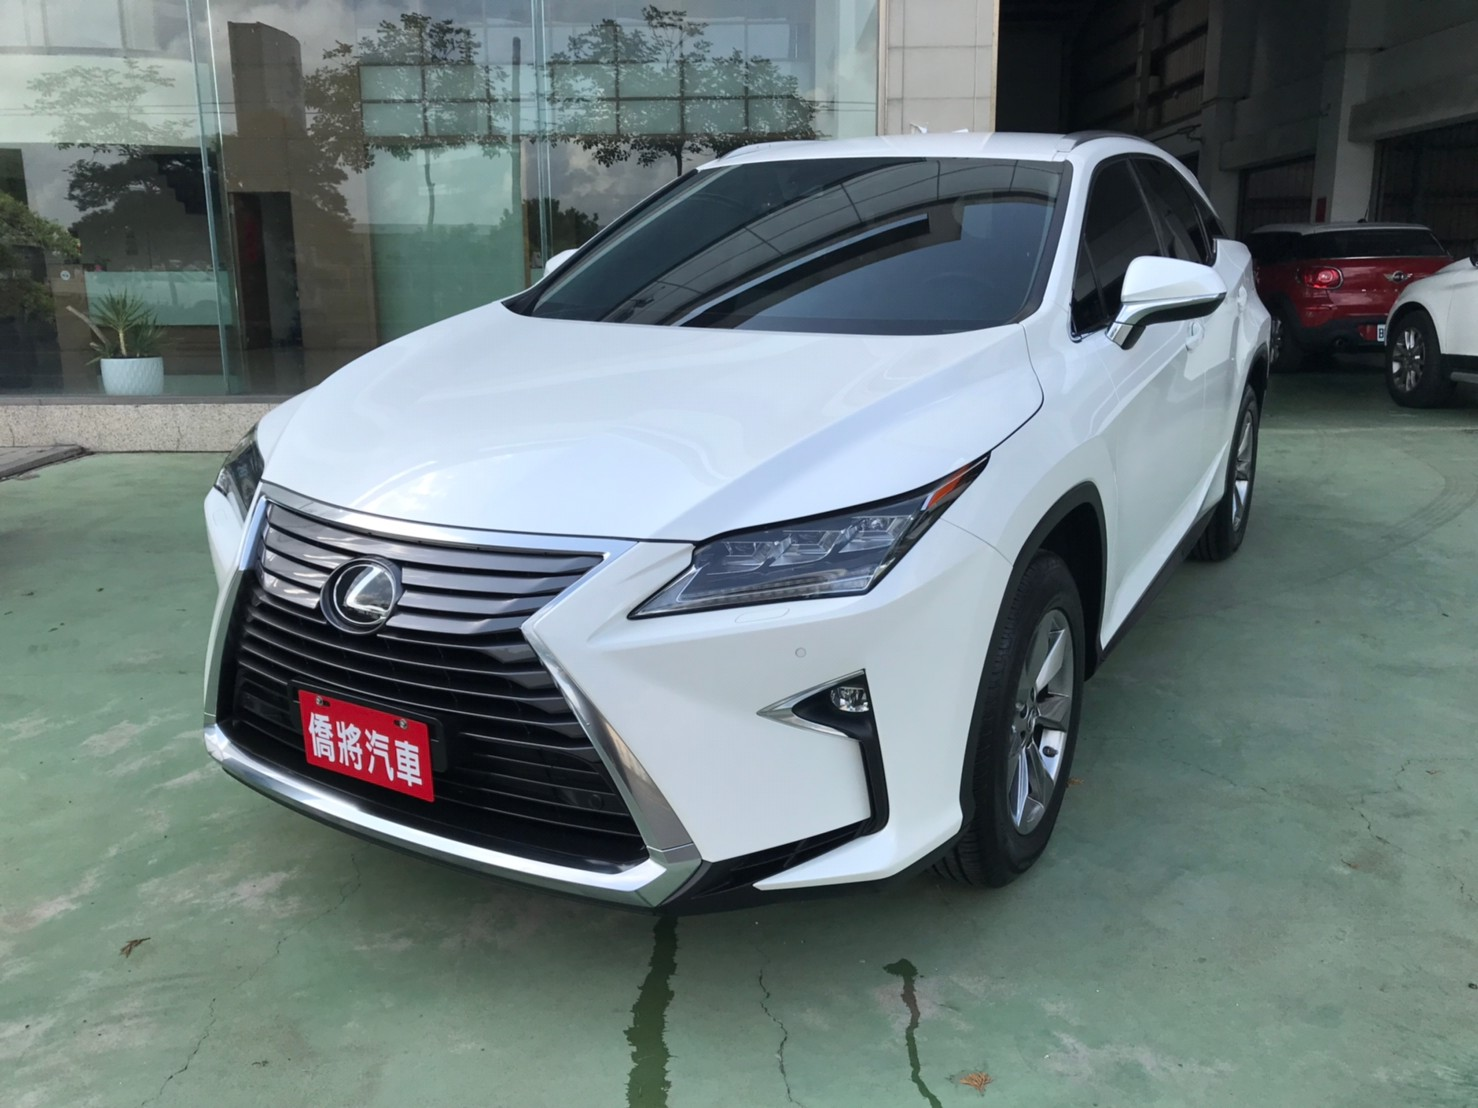 2018RX300白SUM151.8 2.0cc 主動跟車 AEB自動緊急煞車 車道偏離 盲點補助_210620_8